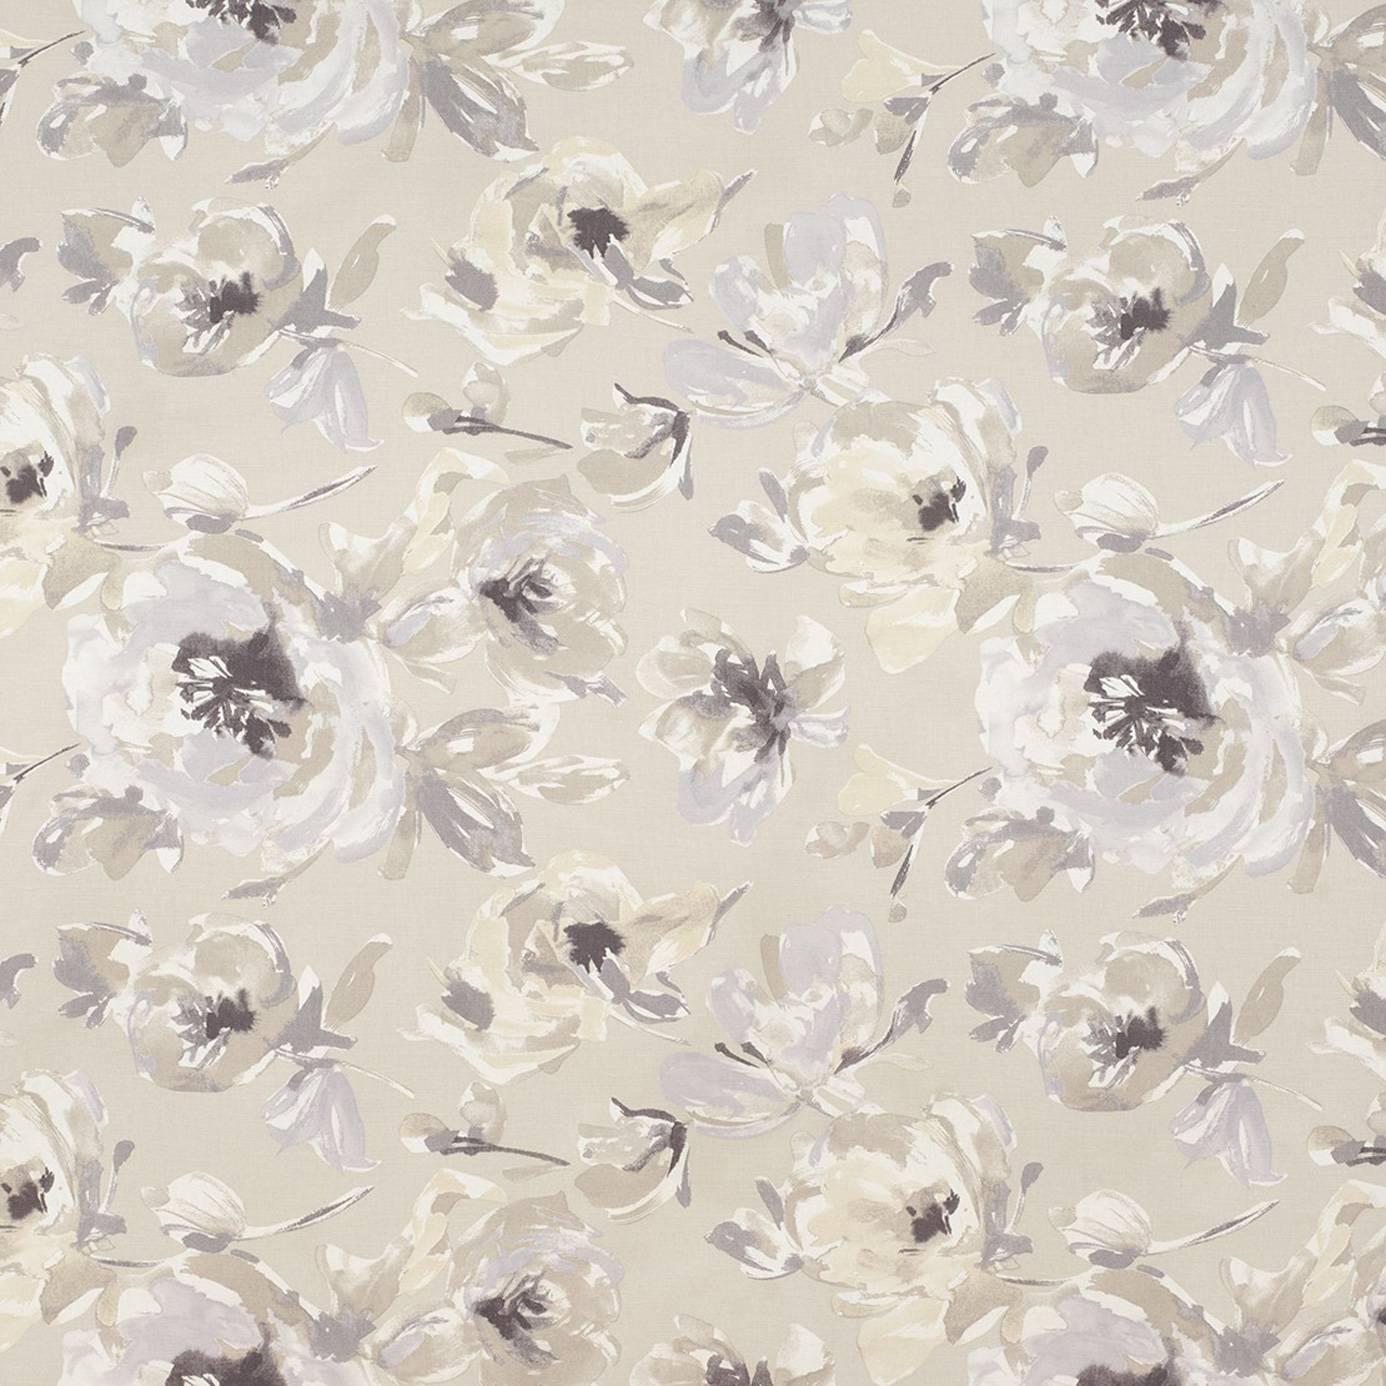 Fleurs Fabric - Beige (26851129) - Casadeco Amazing ... - photo#18